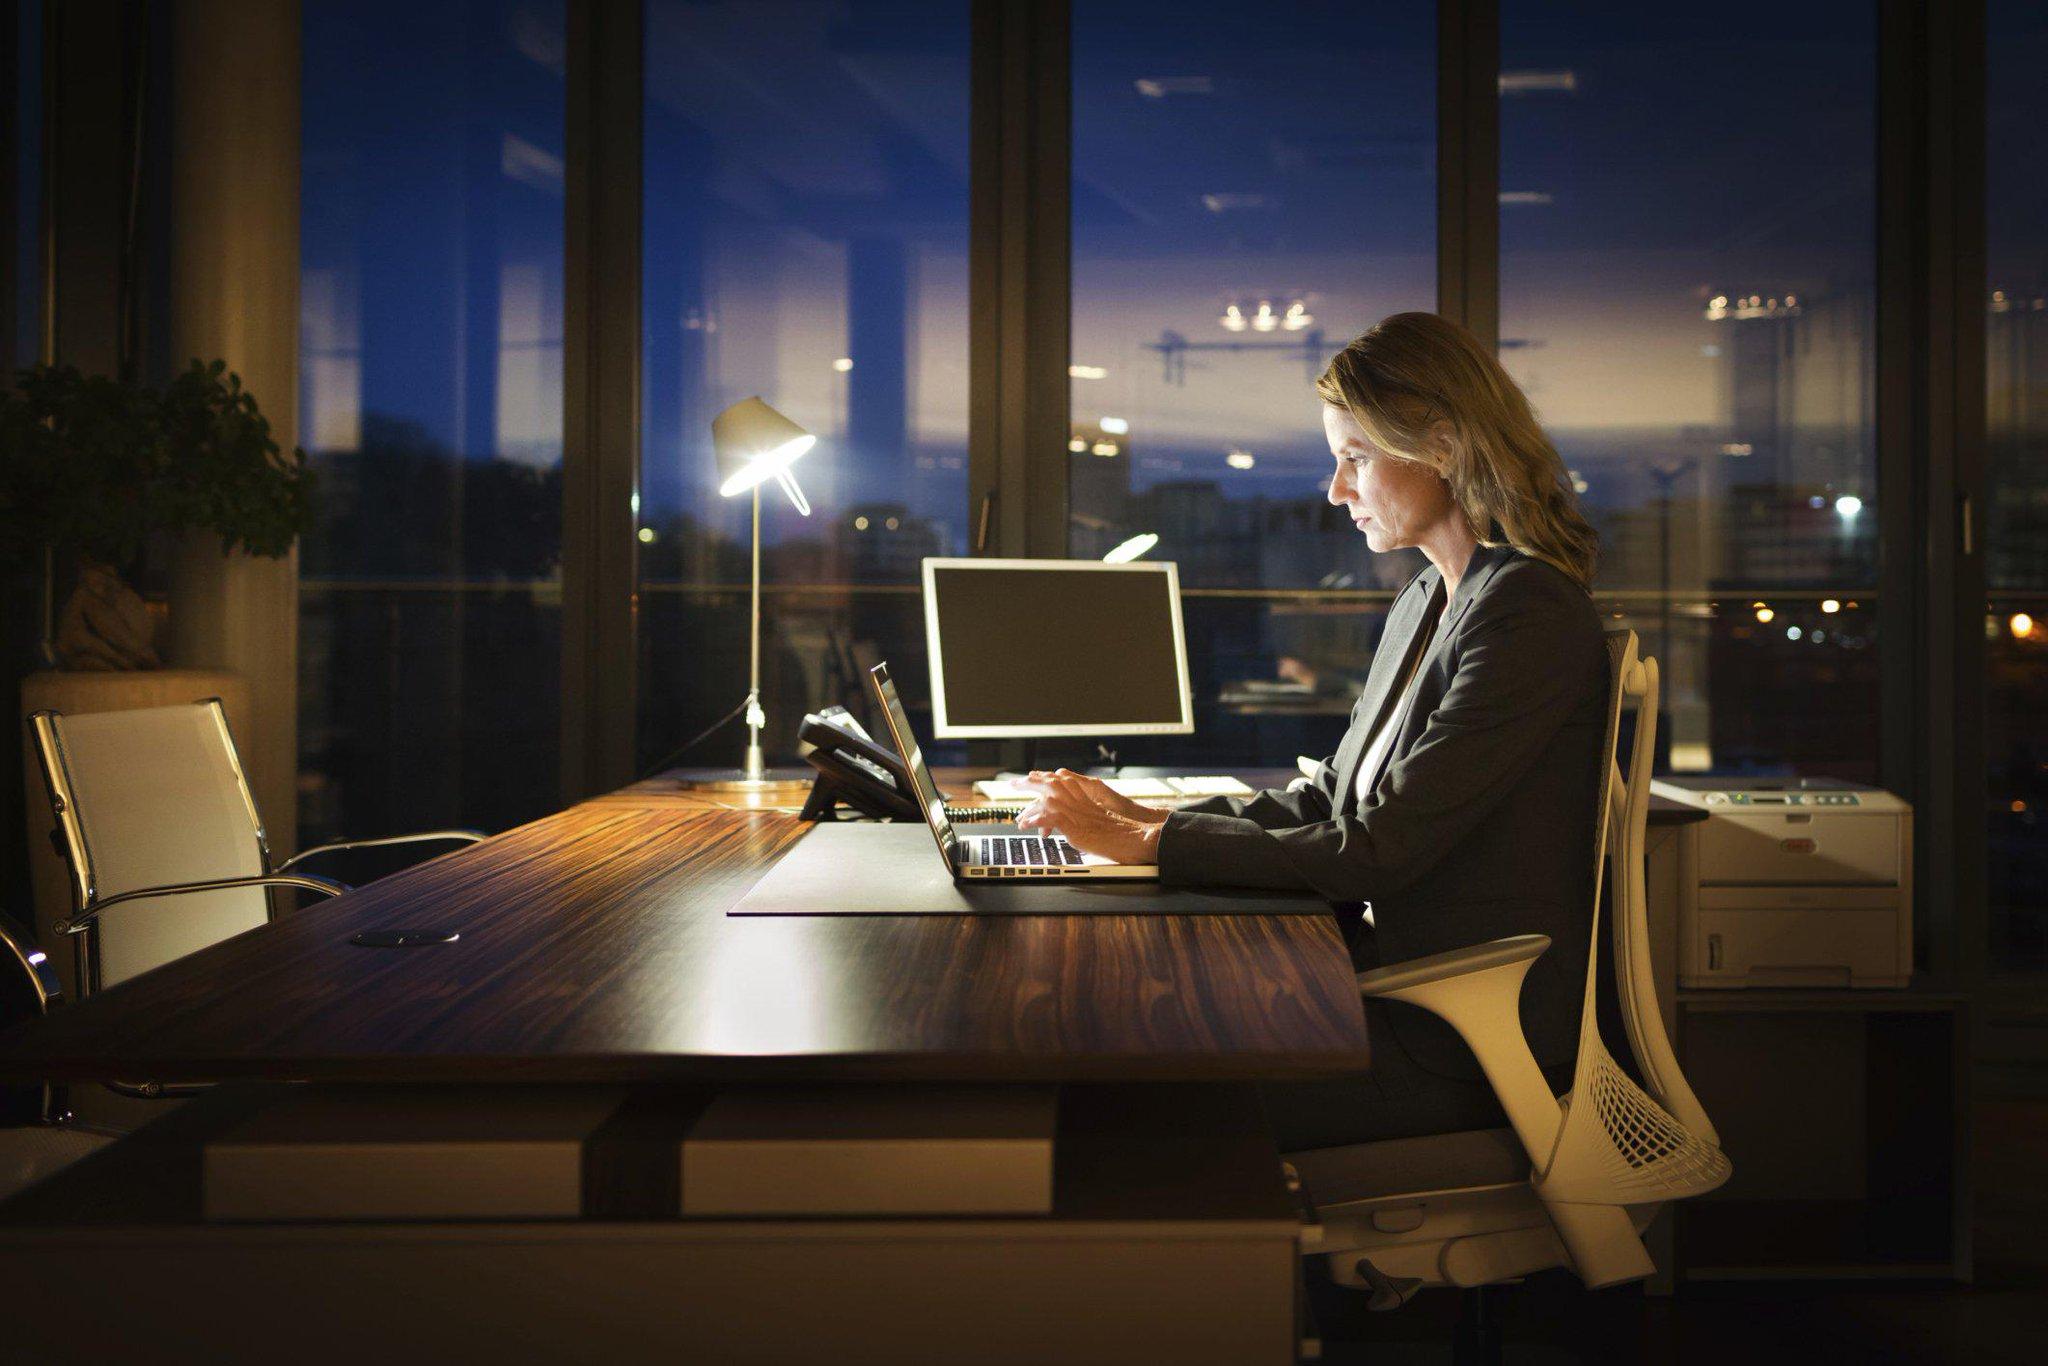 Five ways to defeat workplace stress: http://t.co/ZnWwC6adKj #VirginDisruptors http://t.co/1JGGnfBRAz